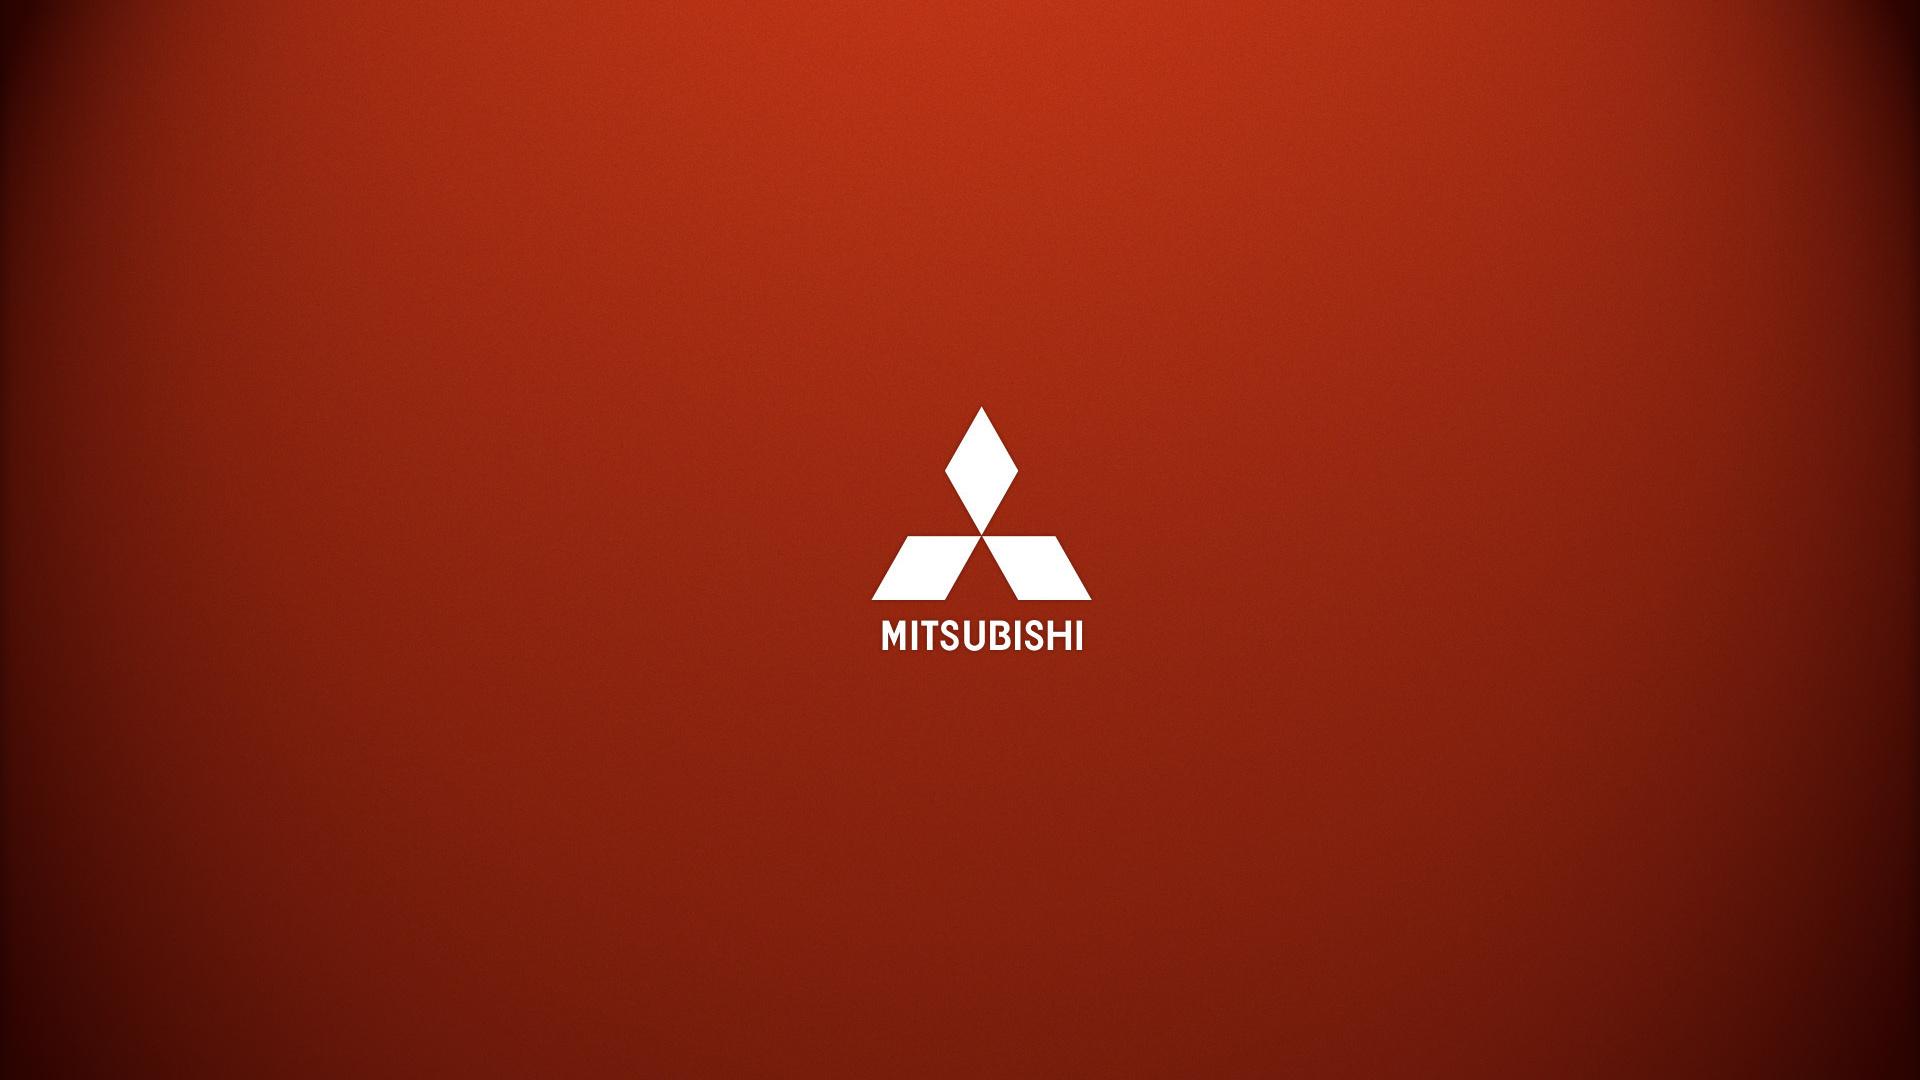 Mitsubishi Logo Wallpaper For Desktop 1920x1080